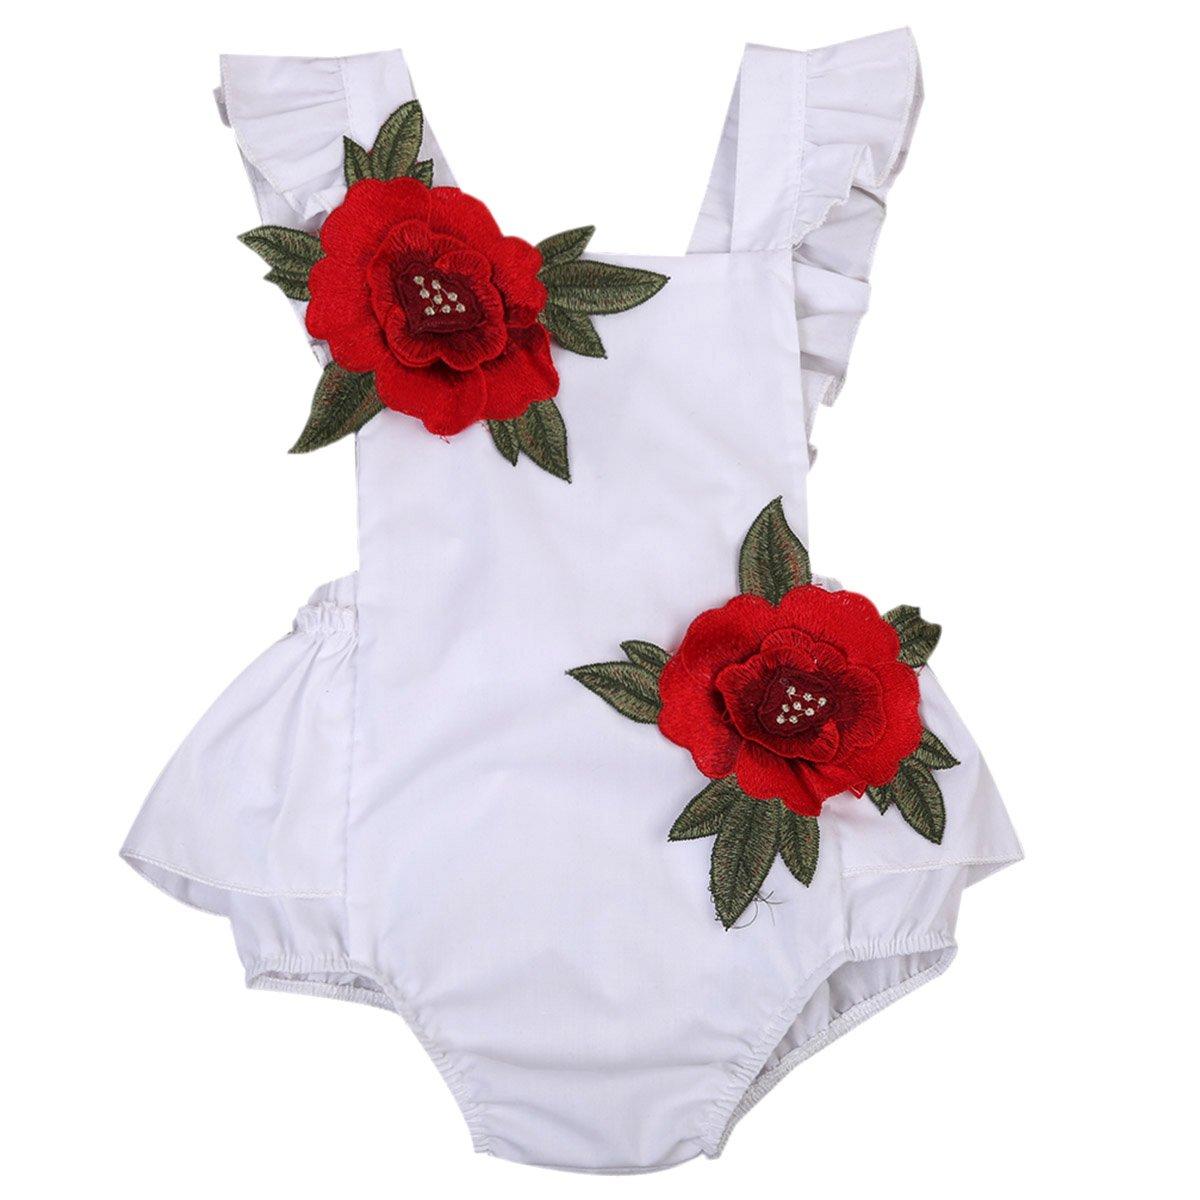 Baby Girls Jumpsuit Newborn Infant Kids Floral Clothes Summer Romper Bodysuit Sundress Outfits (12-18 Months, White)